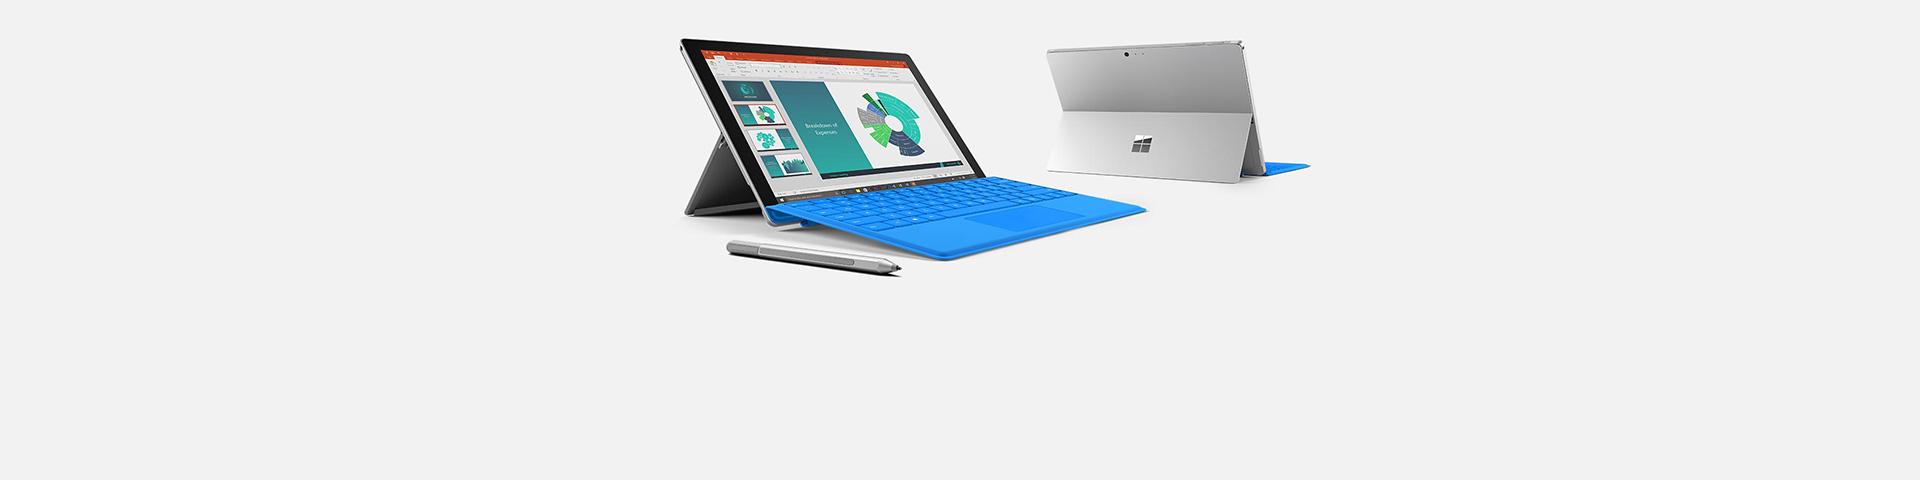 Appareils Surface Pro4